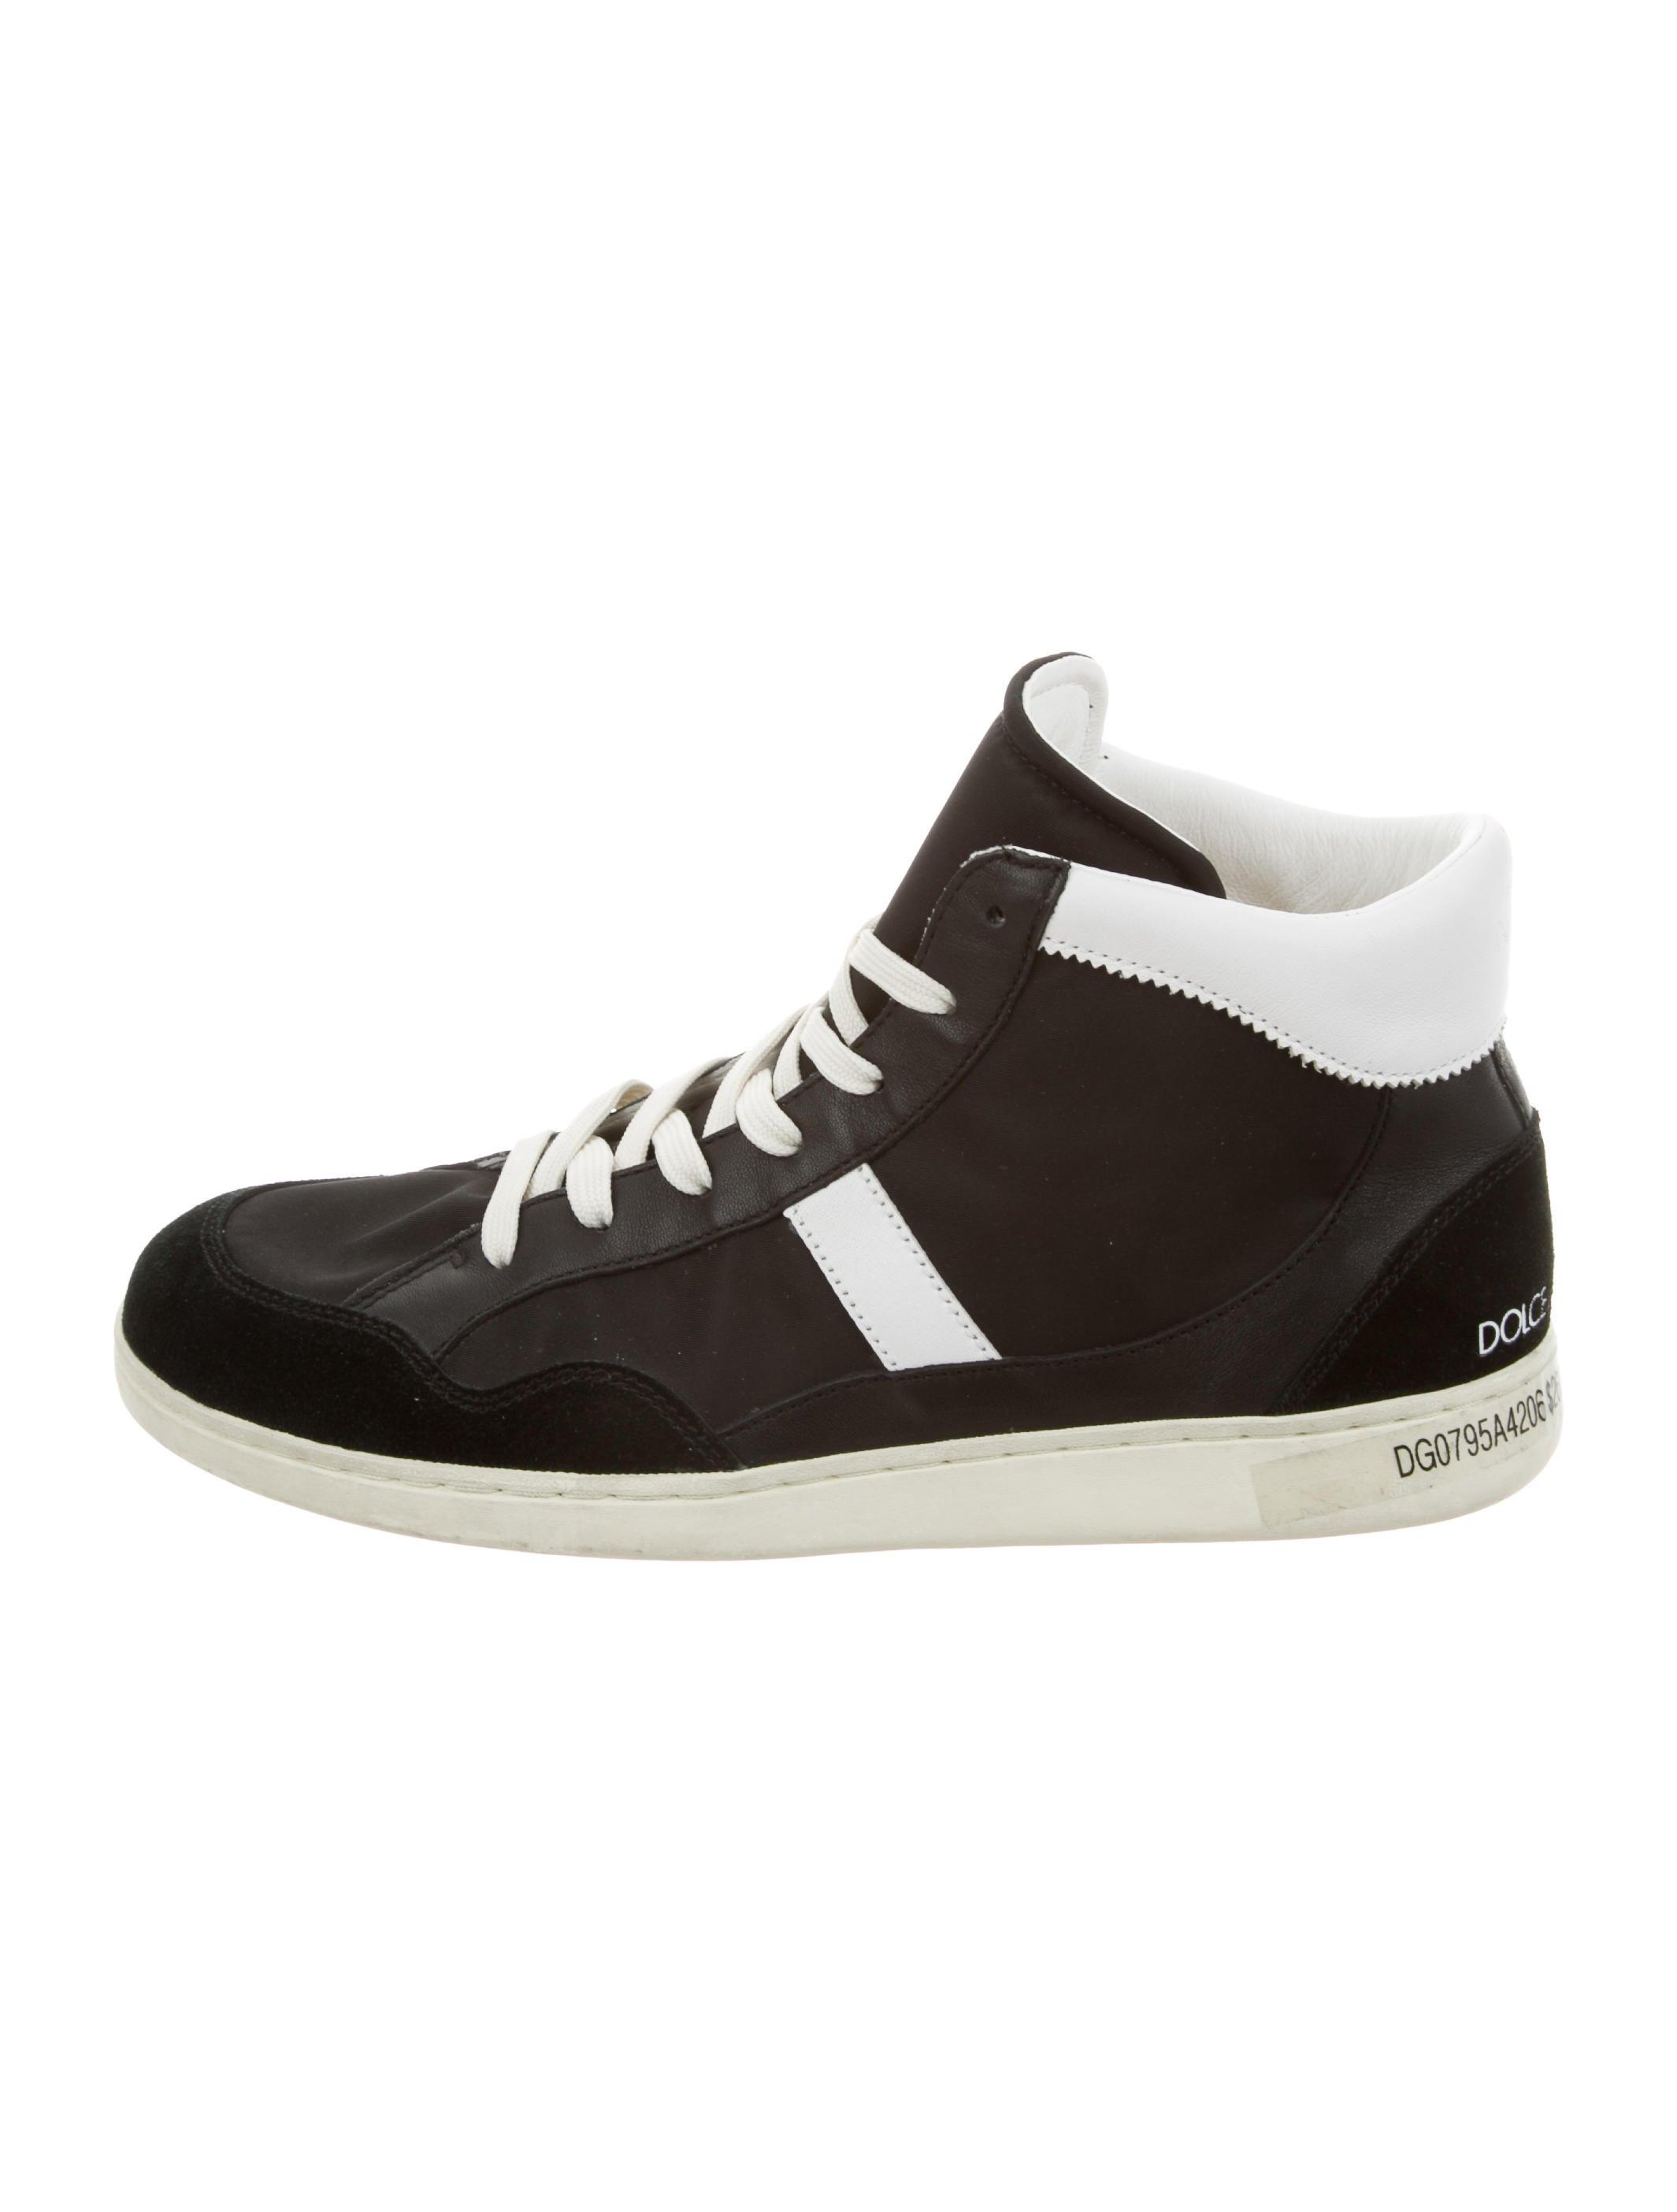 dolce gabbana nylon high top sneakers shoes dag74434. Black Bedroom Furniture Sets. Home Design Ideas